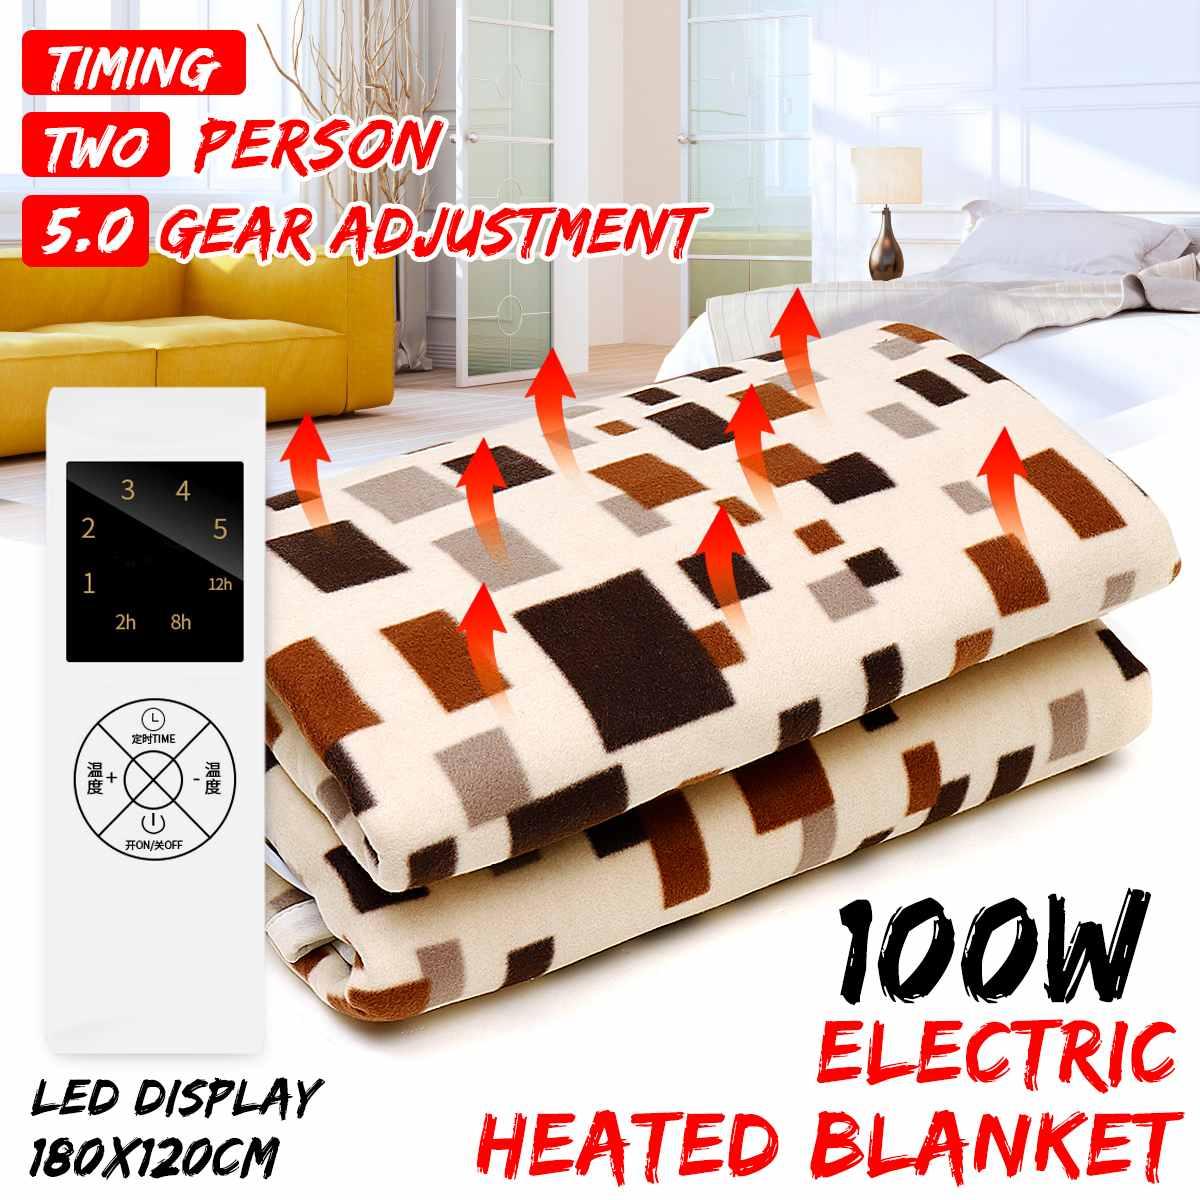 180*120cm  Electric Blanket Mat Waterproof Electric Heated Blanket 100W 5 Gear Timing Function Electrical Heater Heating Carpet